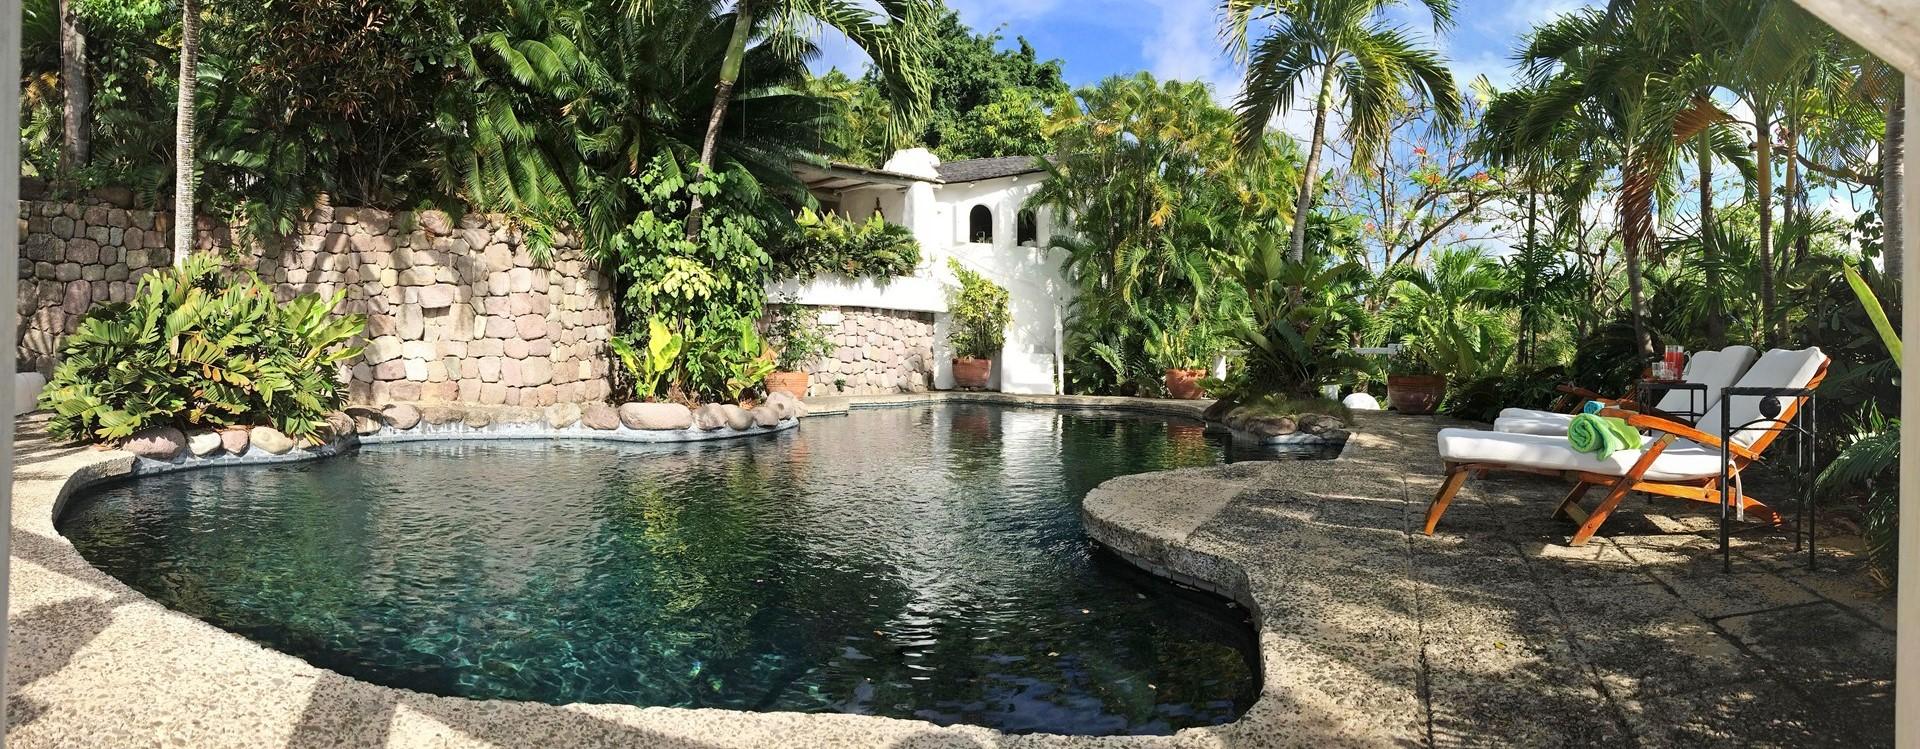 villa-smugglers-nest-swimming-pool